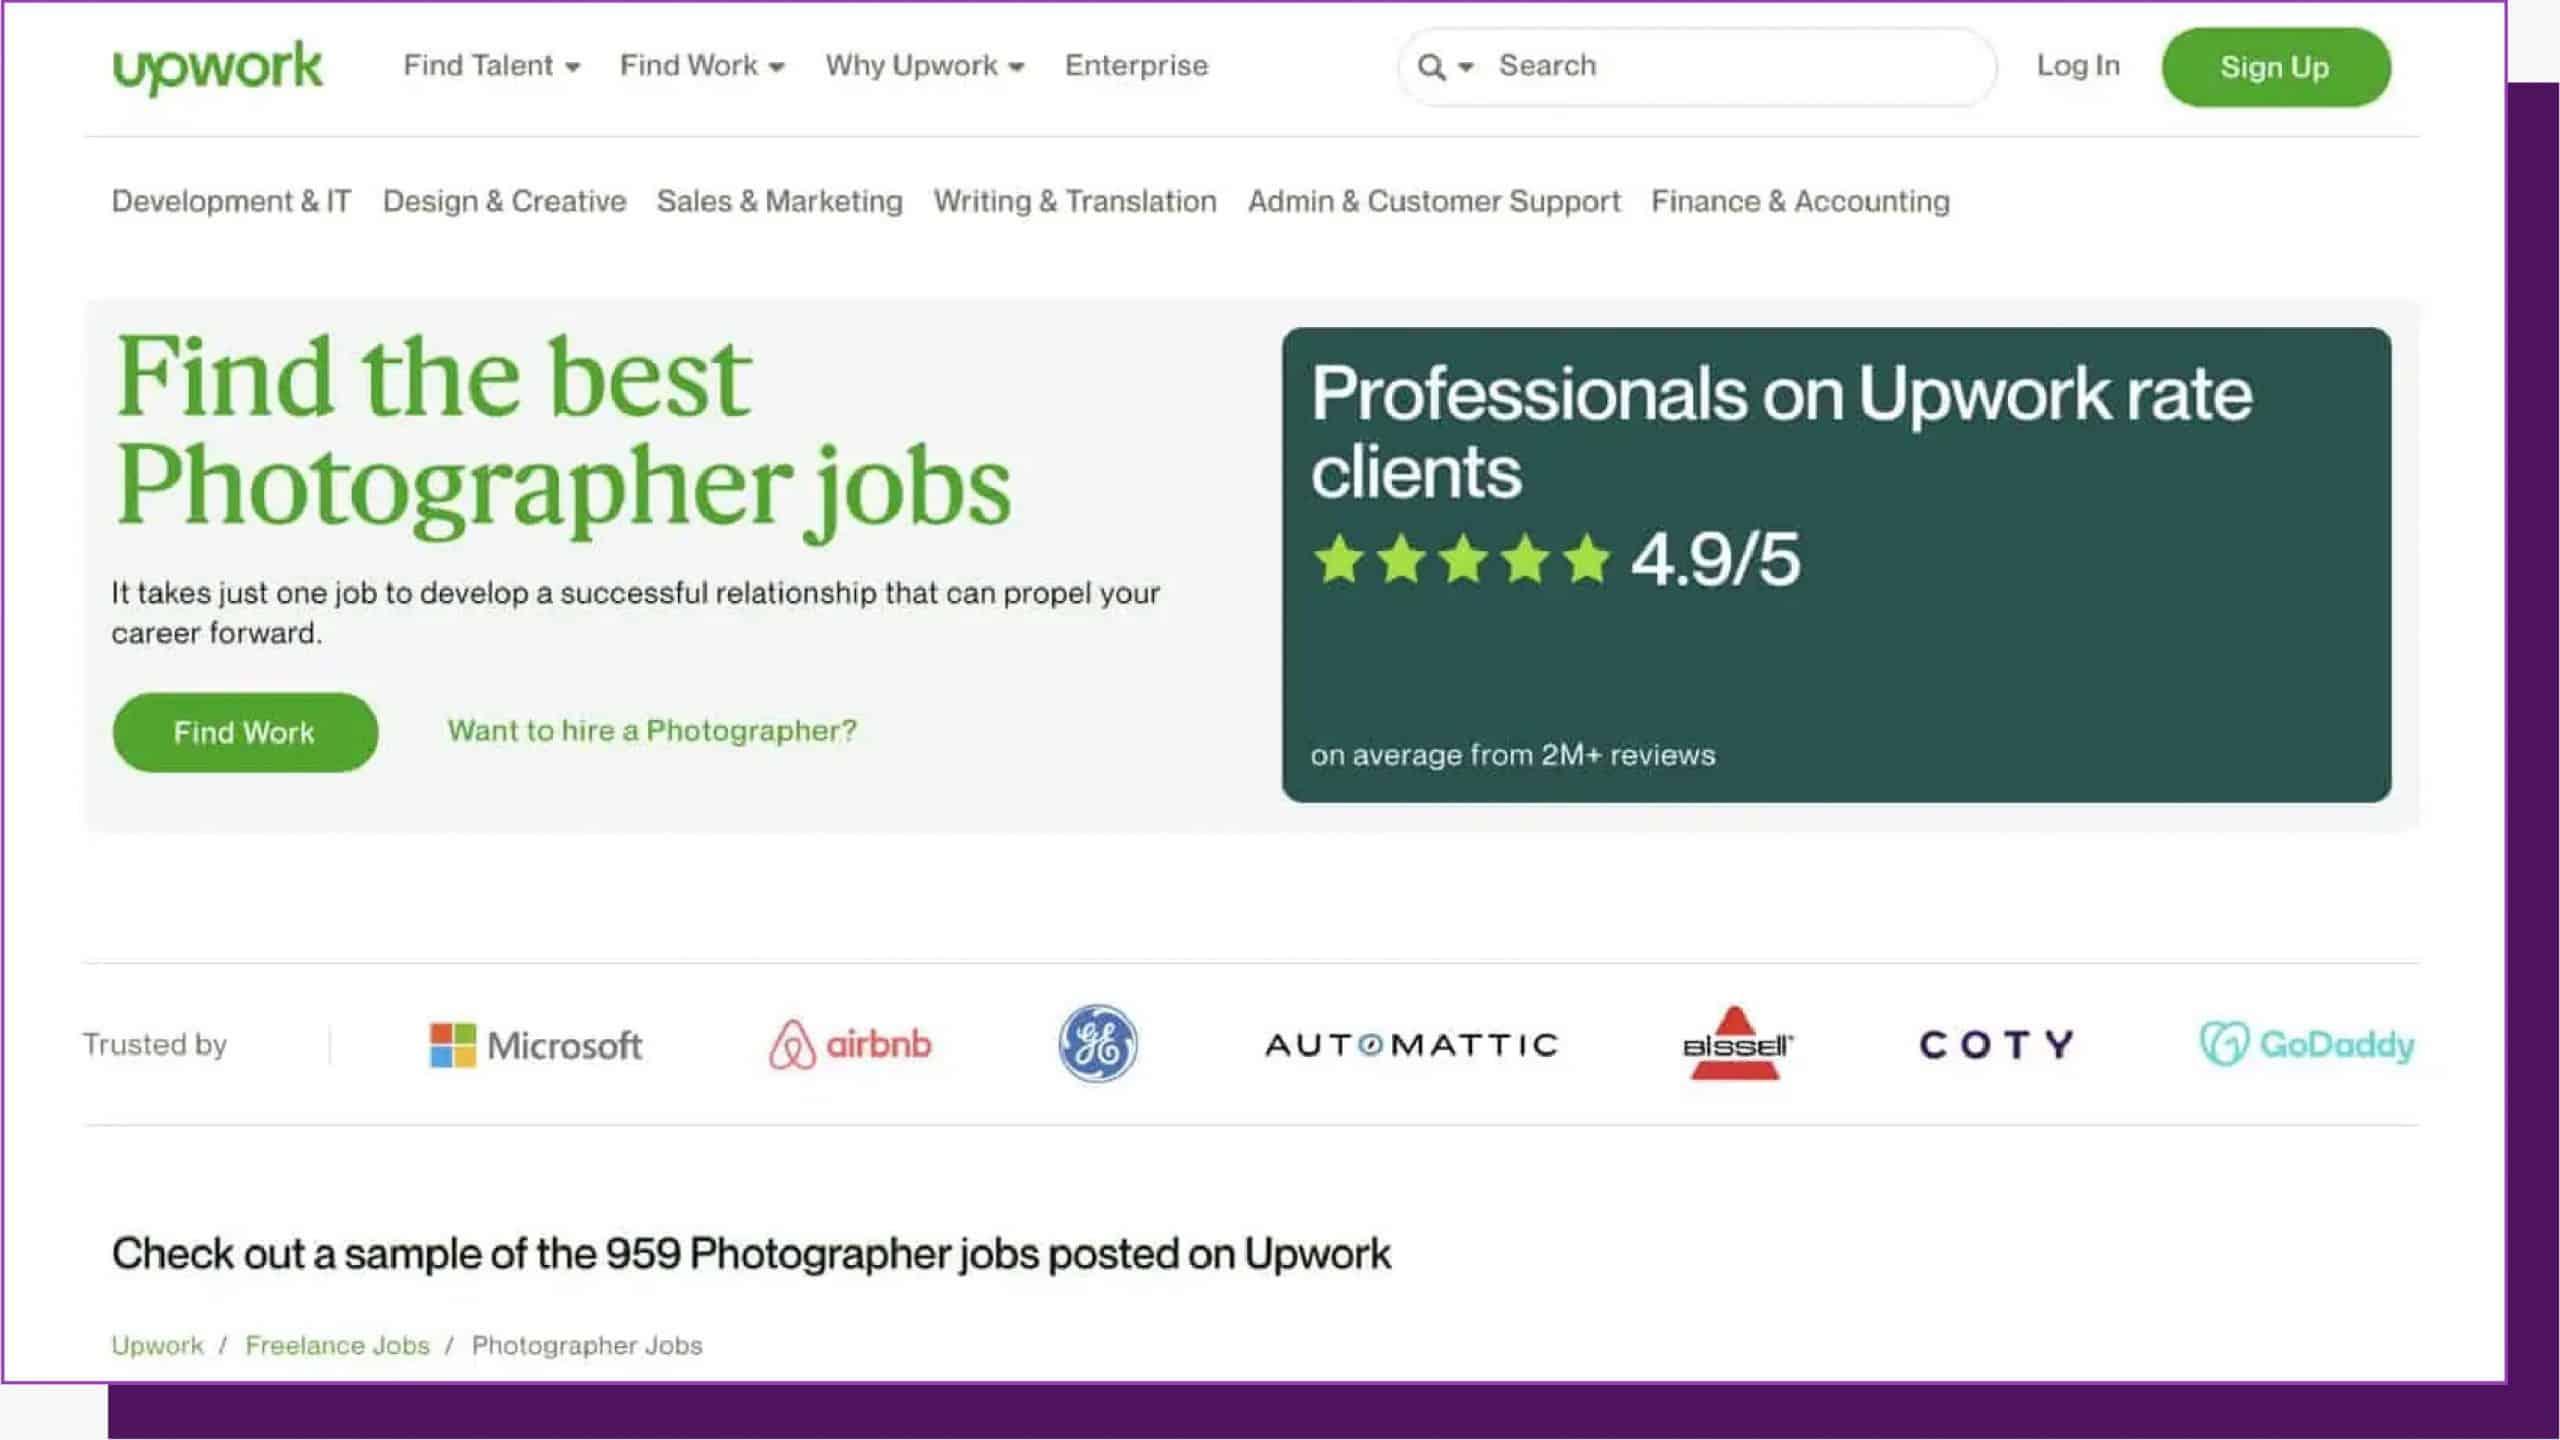 Photographer jobs on UpWork